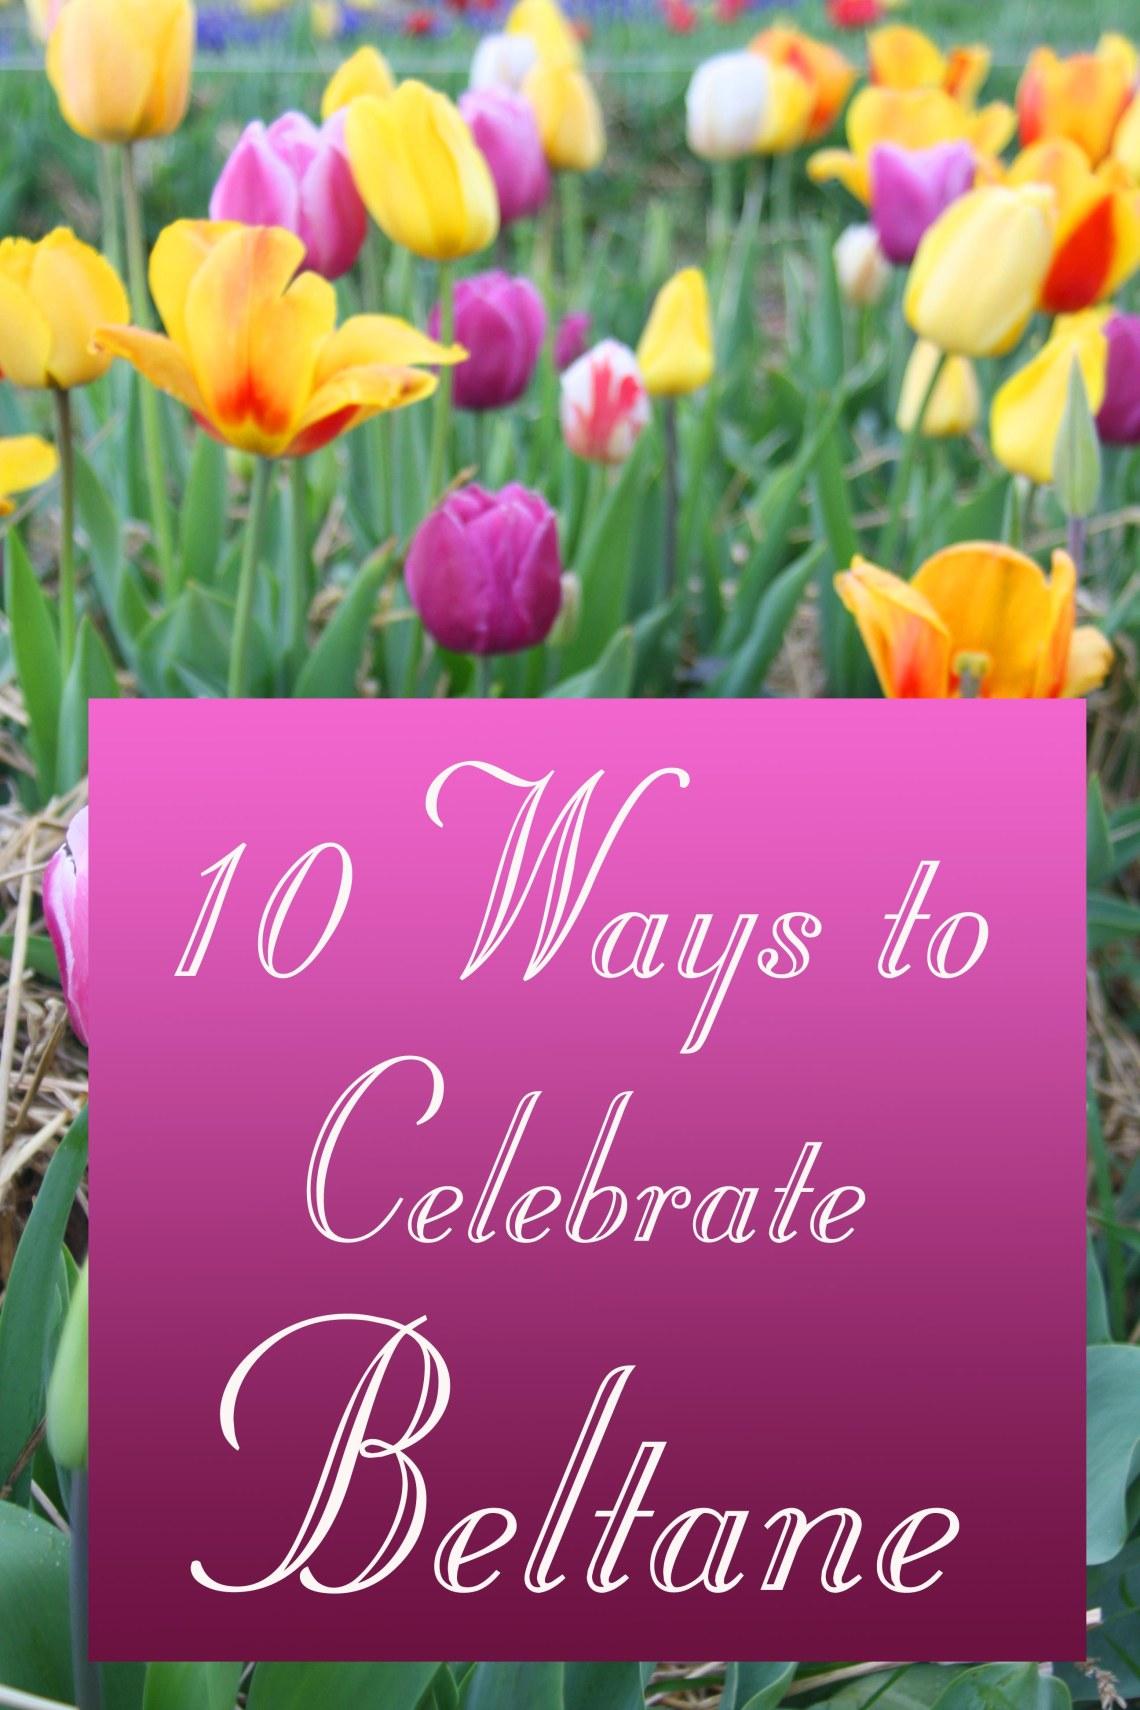 10 Ways to Celebrate Beltane